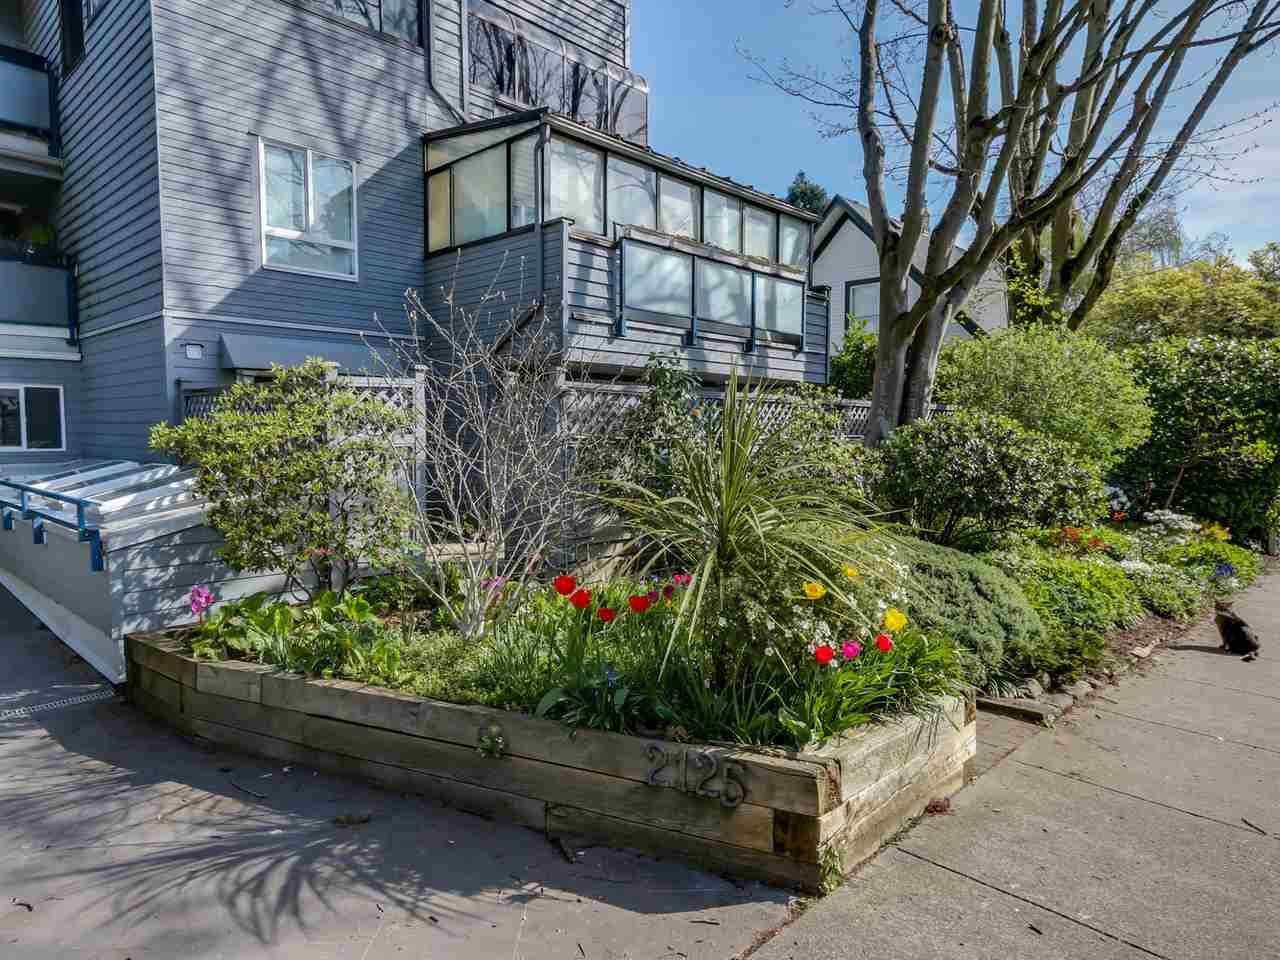 "Main Photo: 115 2125 YORK Avenue in Vancouver: Kitsilano Condo for sale in ""YORK GARDENS"" (Vancouver West)  : MLS®# R2054686"